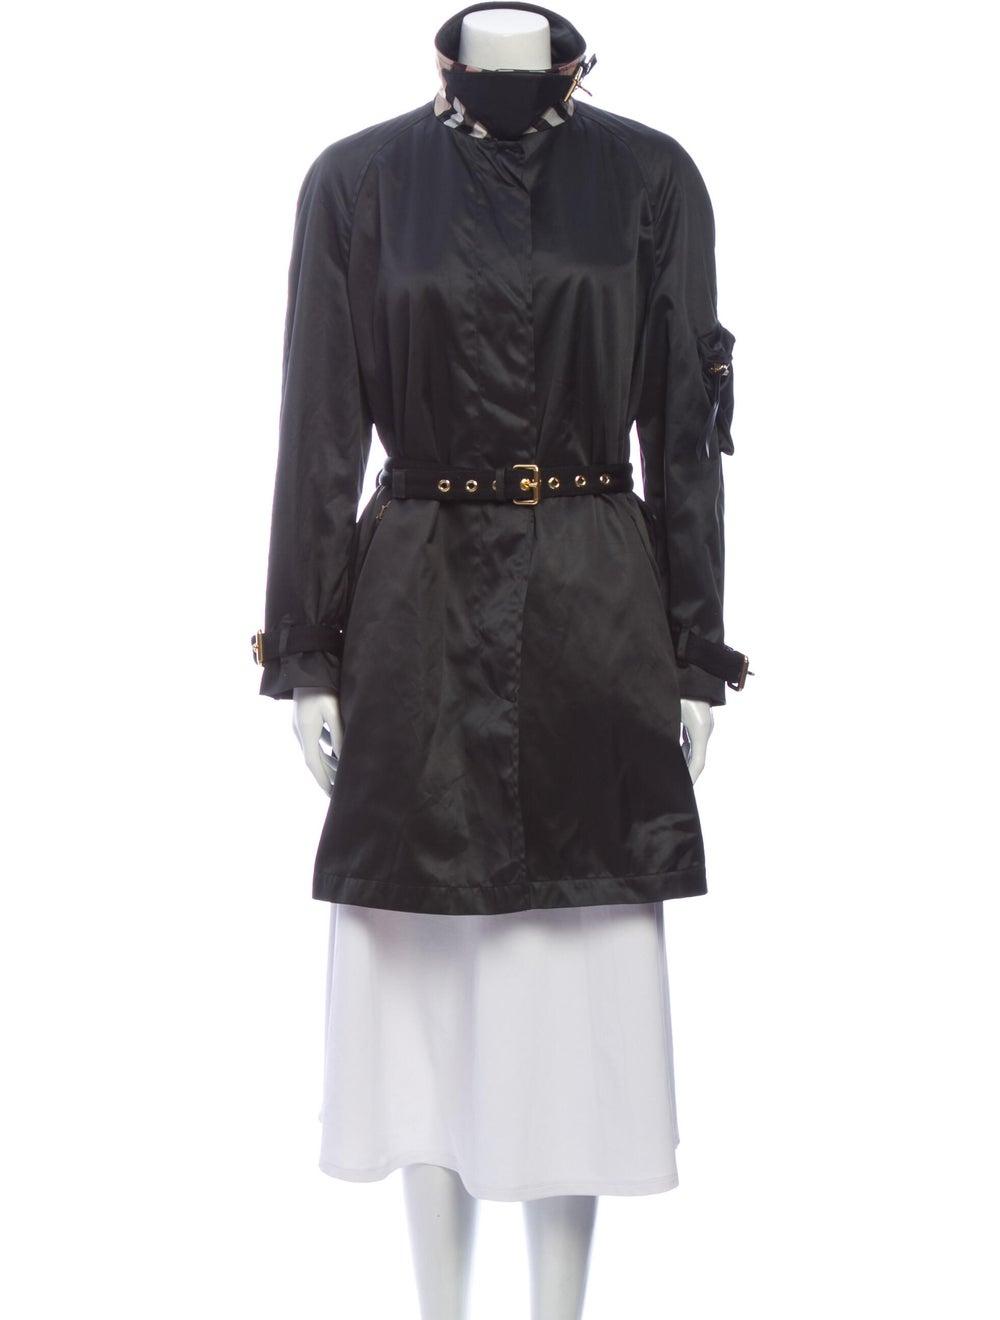 Burberry Trench Coat Black - image 1